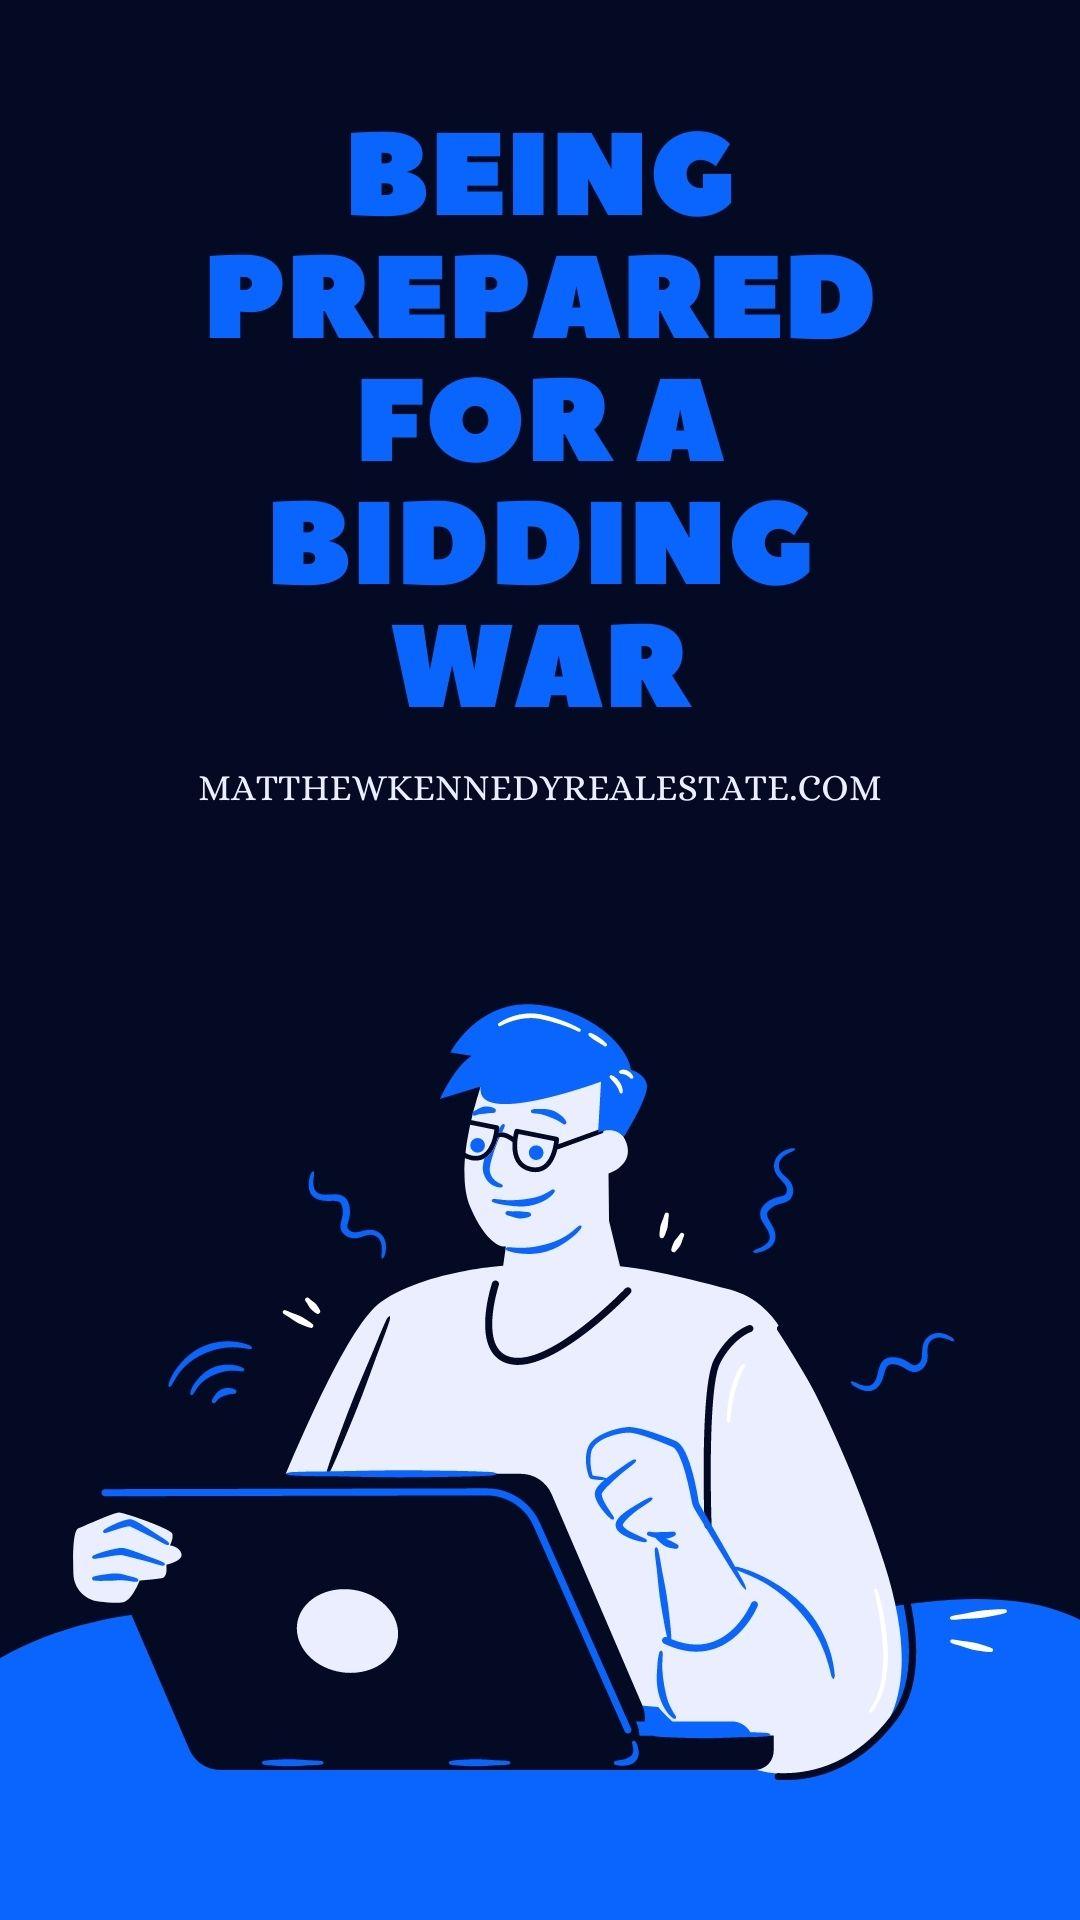 Being Prepared for a Bidding War